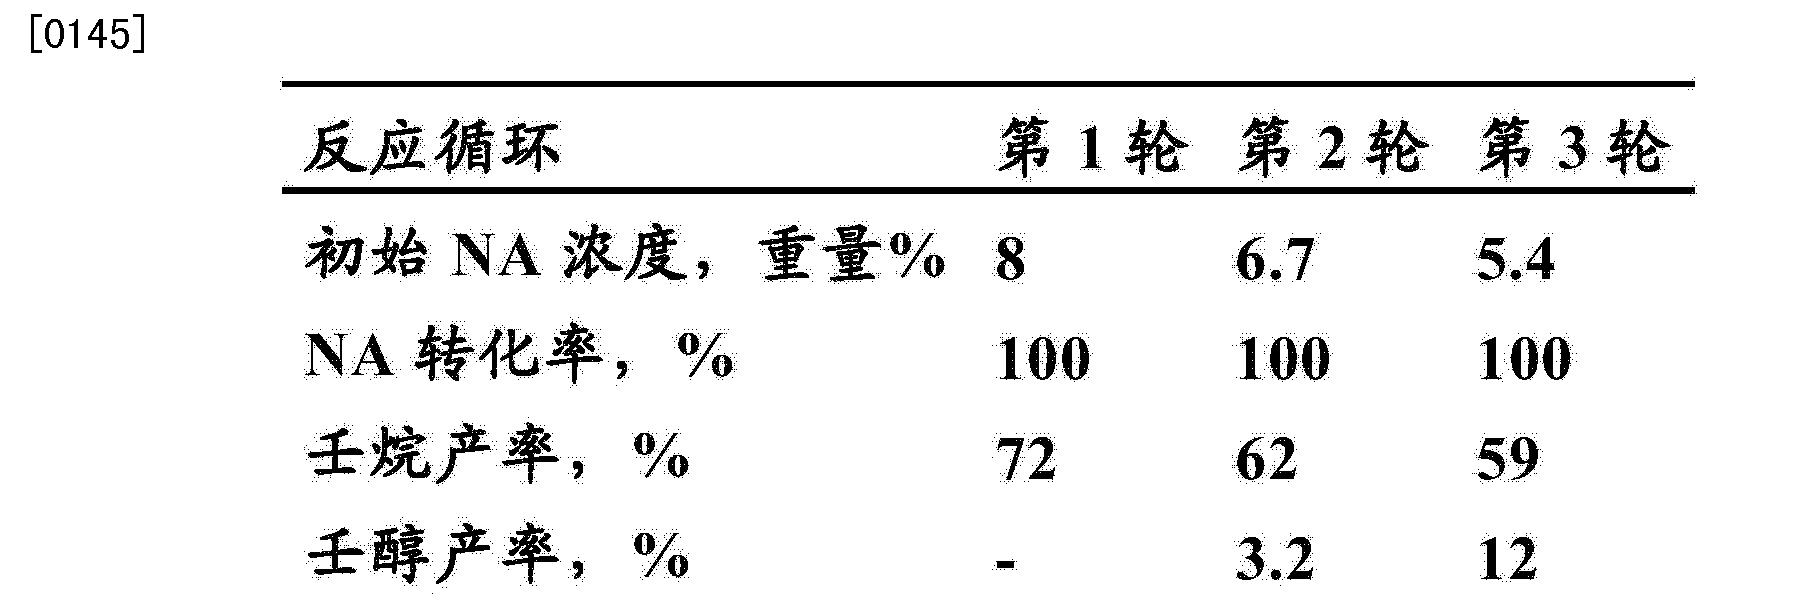 Figure CN104428060AD00192